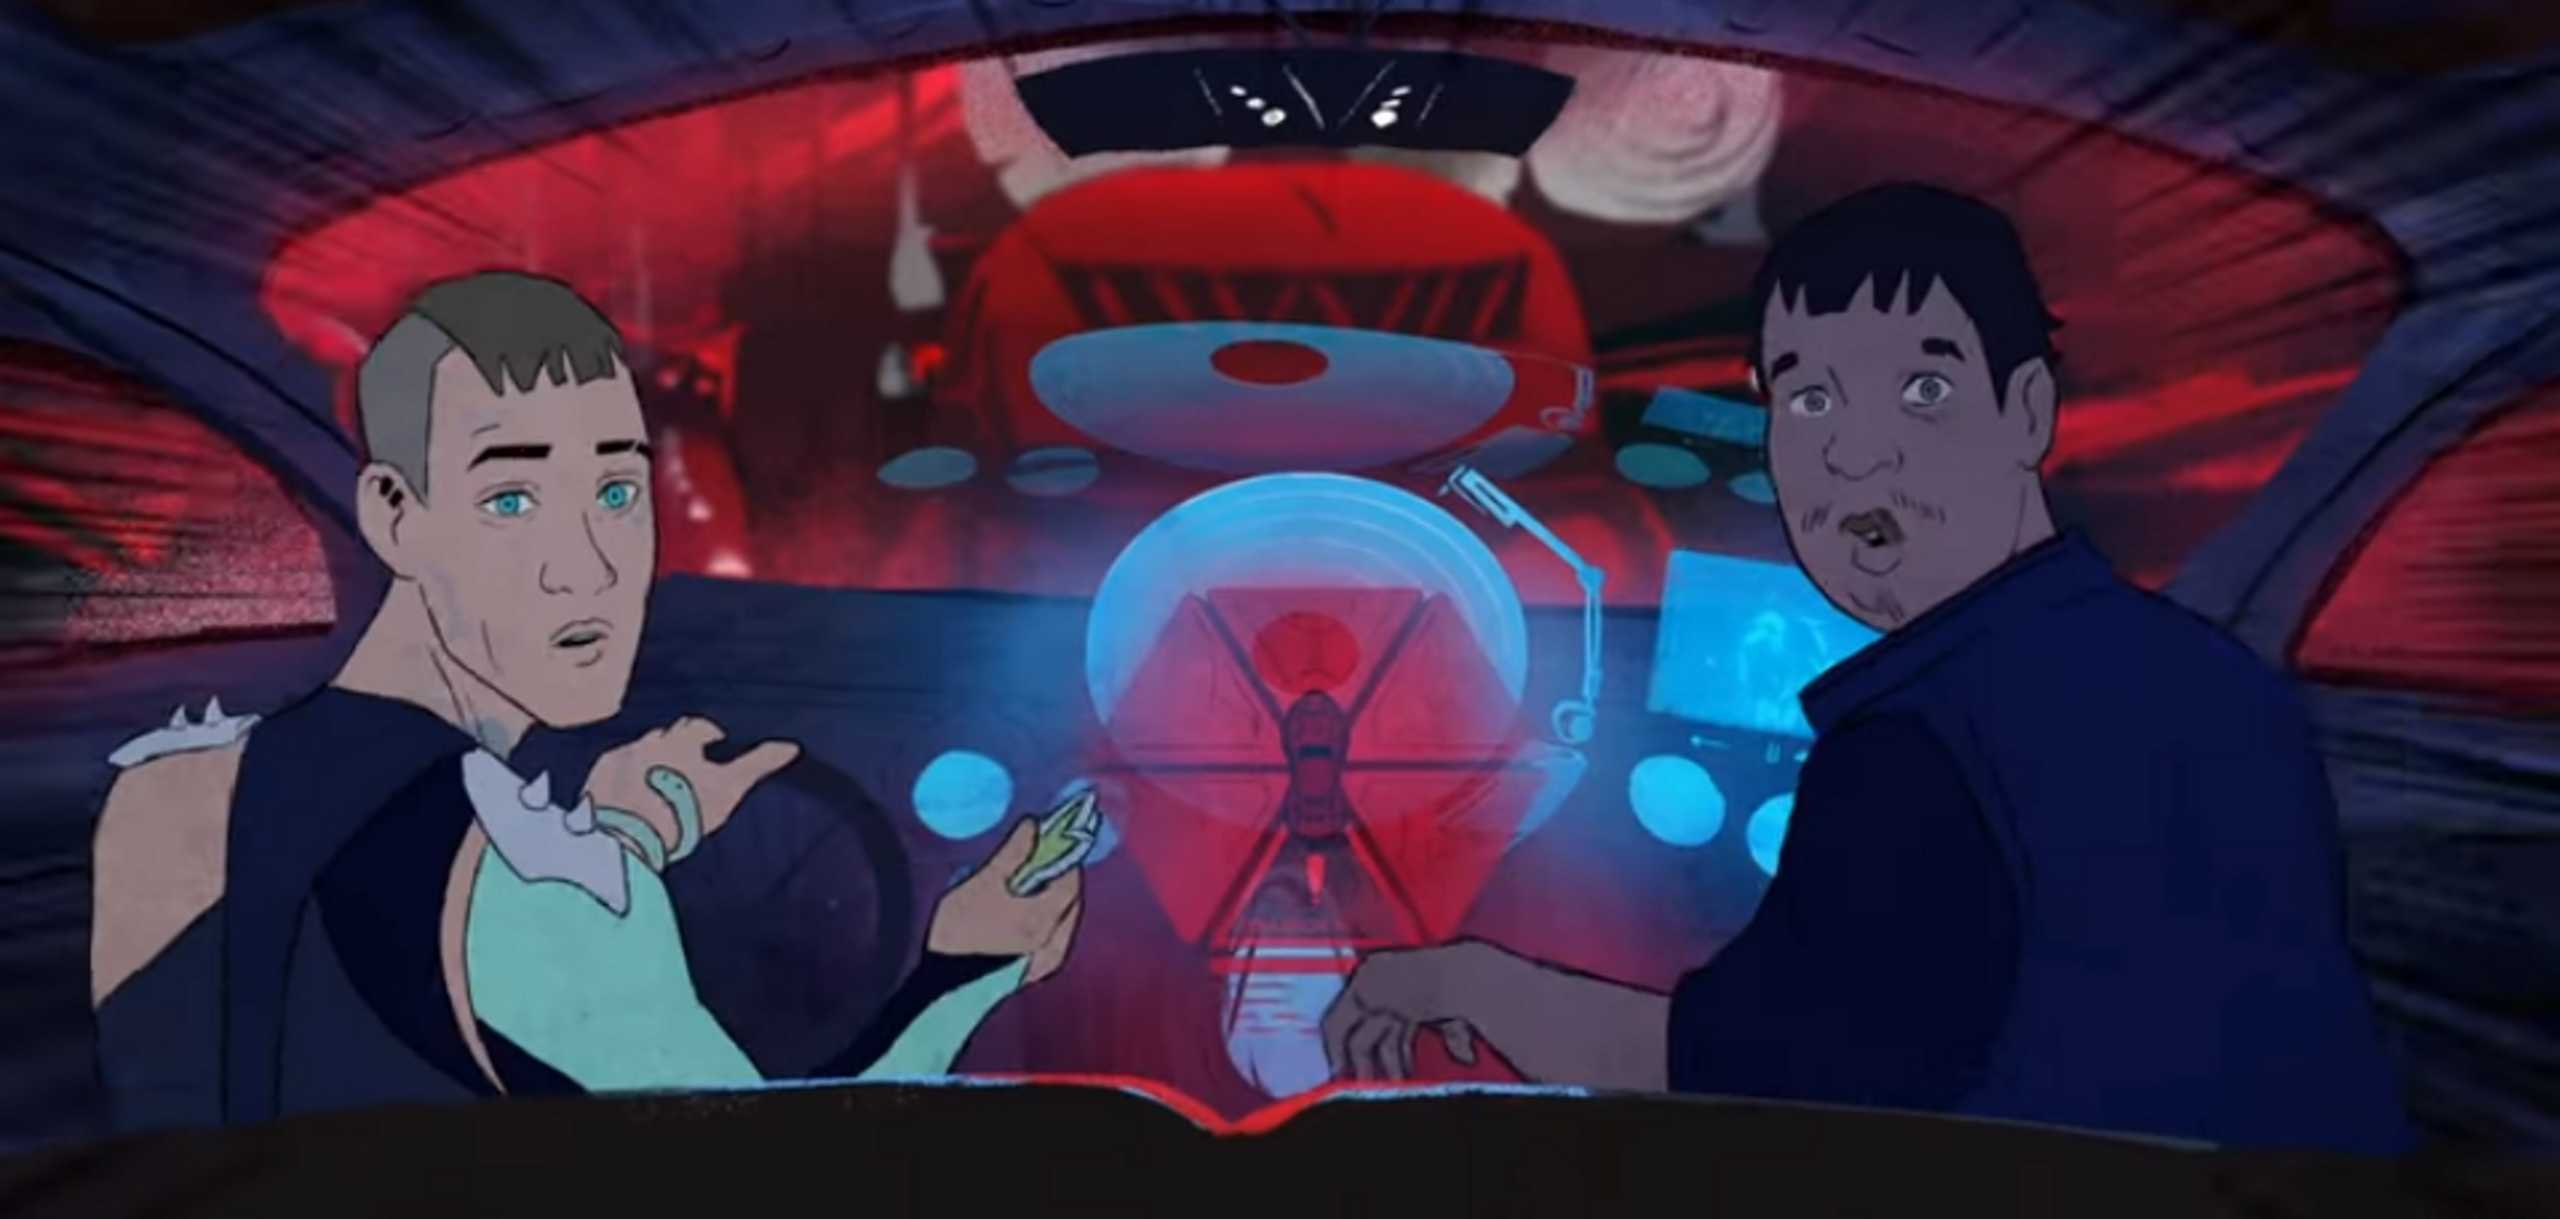 Smashing Pumpkins: Sci-fi δυστοπική σειρά animation (video)